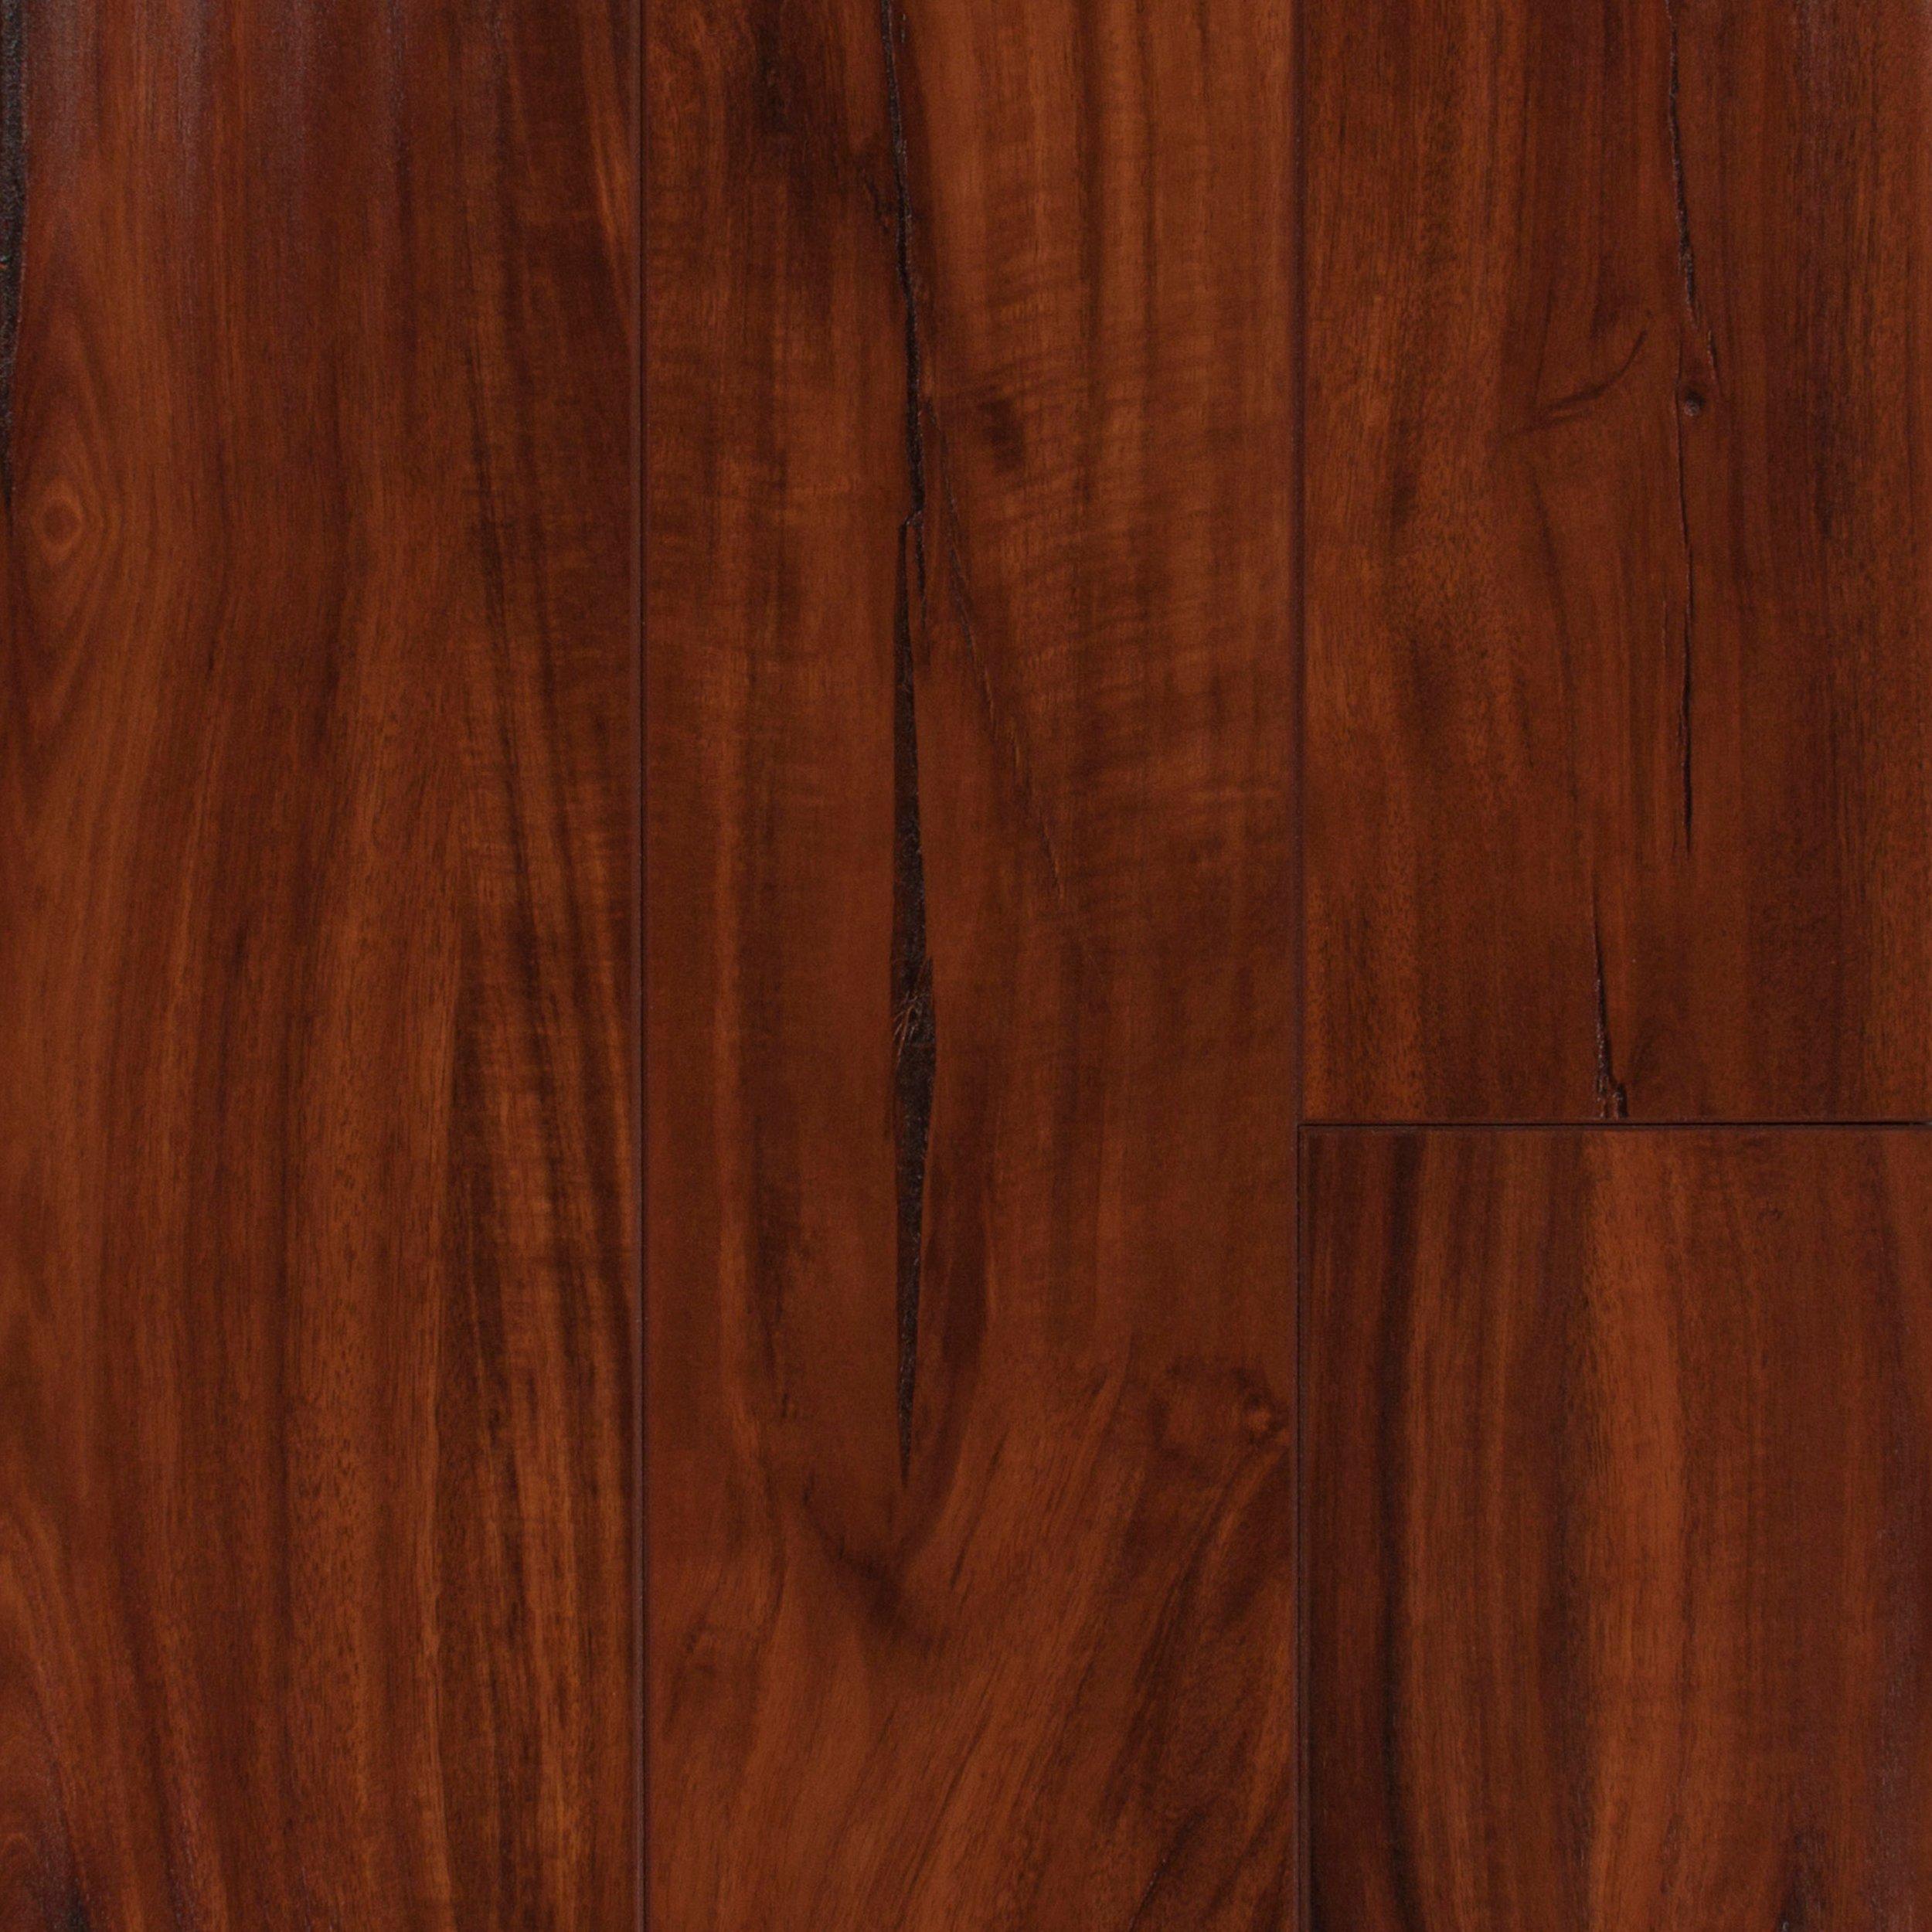 Spice Acacia Random Length Hand Scraped Laminate 12mm 100087782